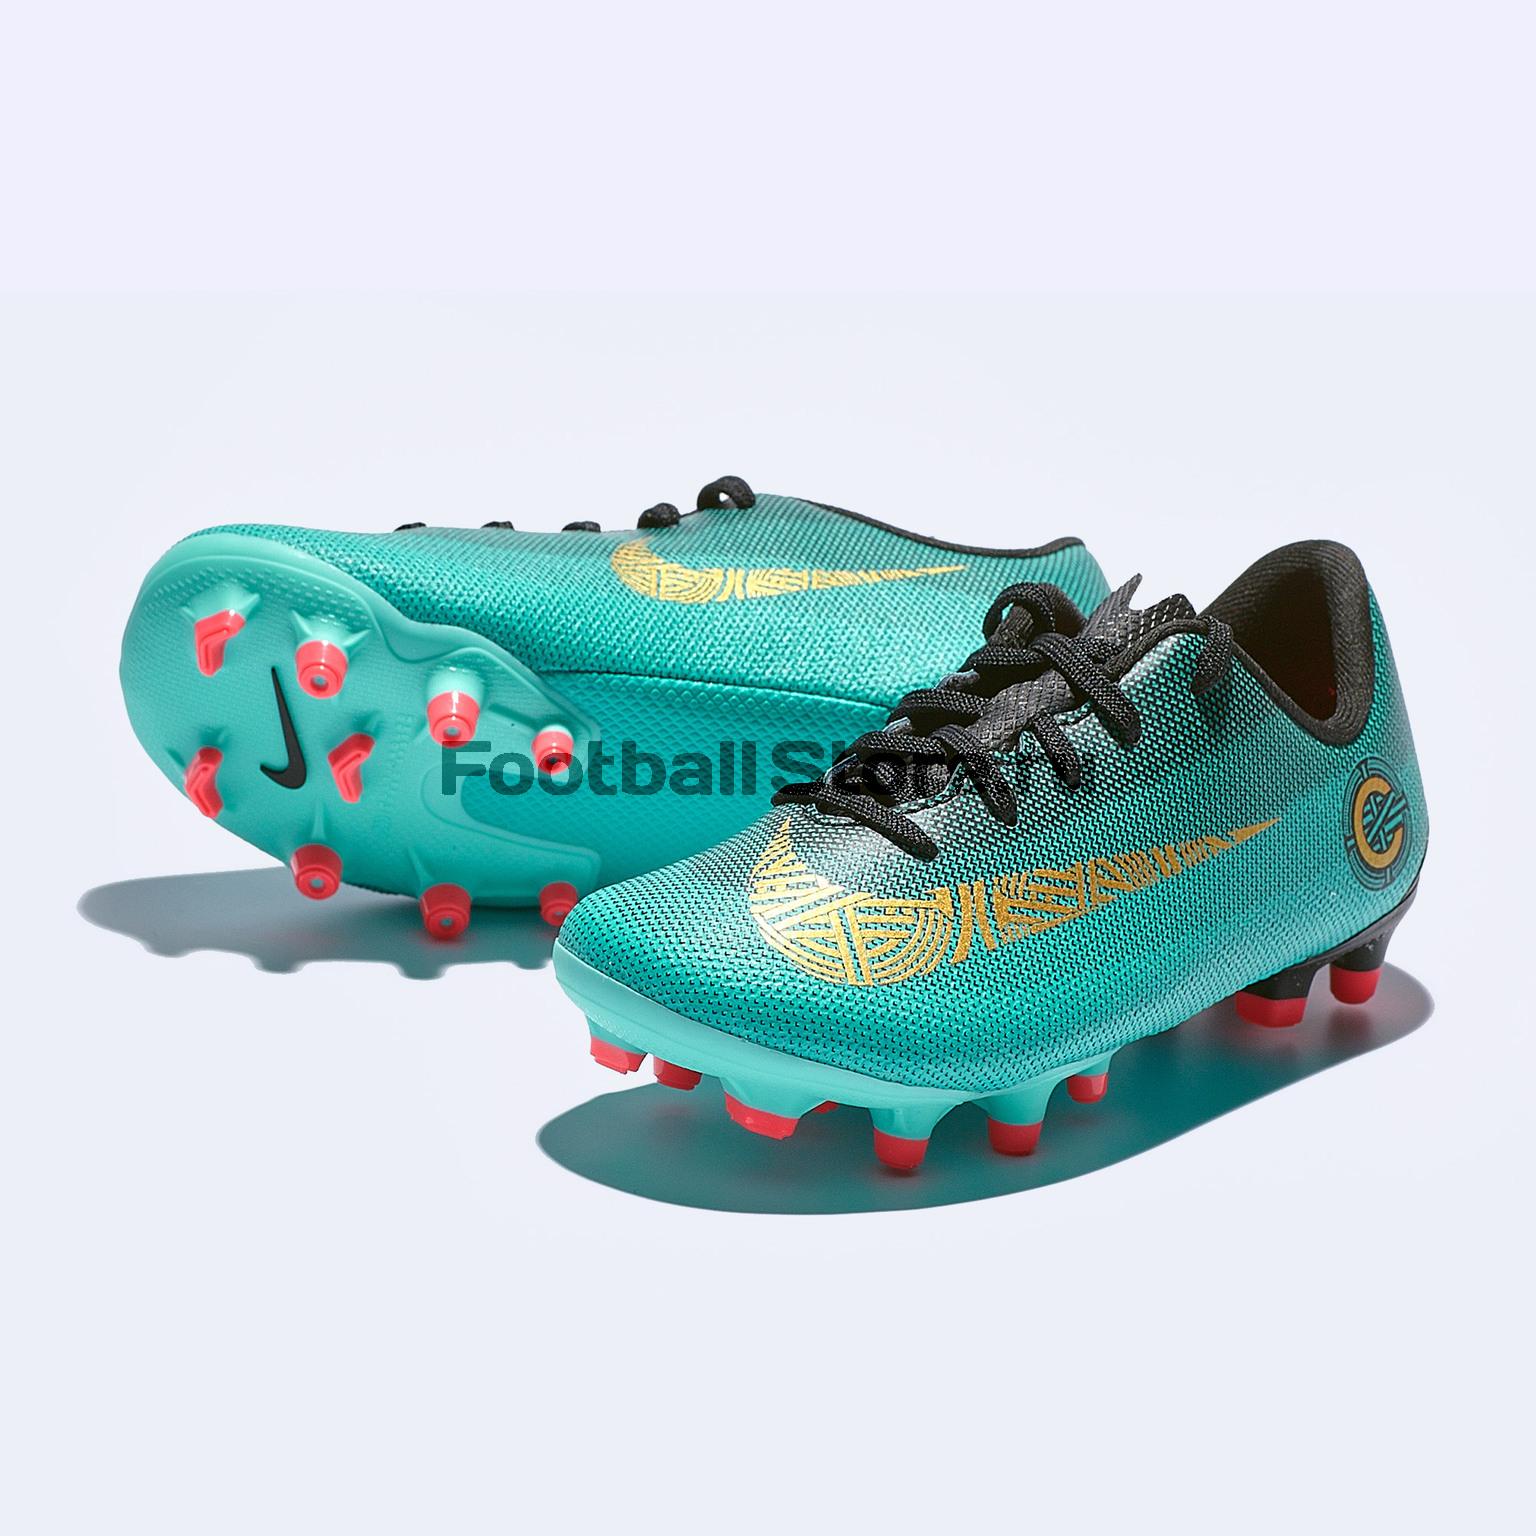 Бутсы детские Nike Vapor 12 Academy PS FG/MG AJ3090-390 бутсы детские nike vapor 12 academy gs fg mg ah7347 070